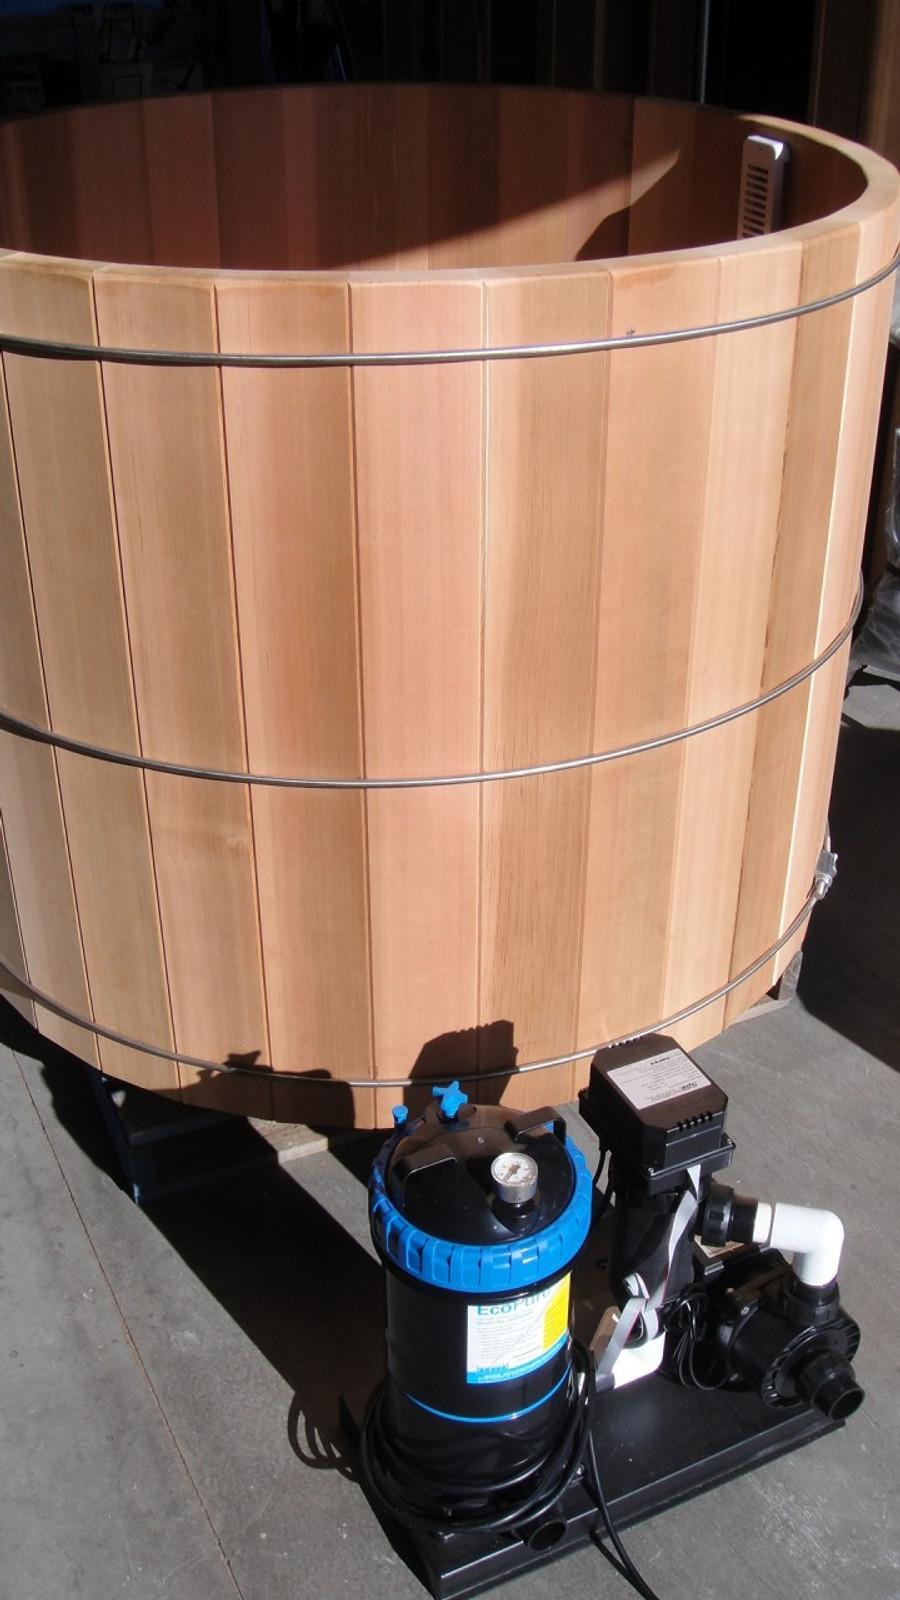 cedar barrel hot tub - 5ft diameter. prices starting from...